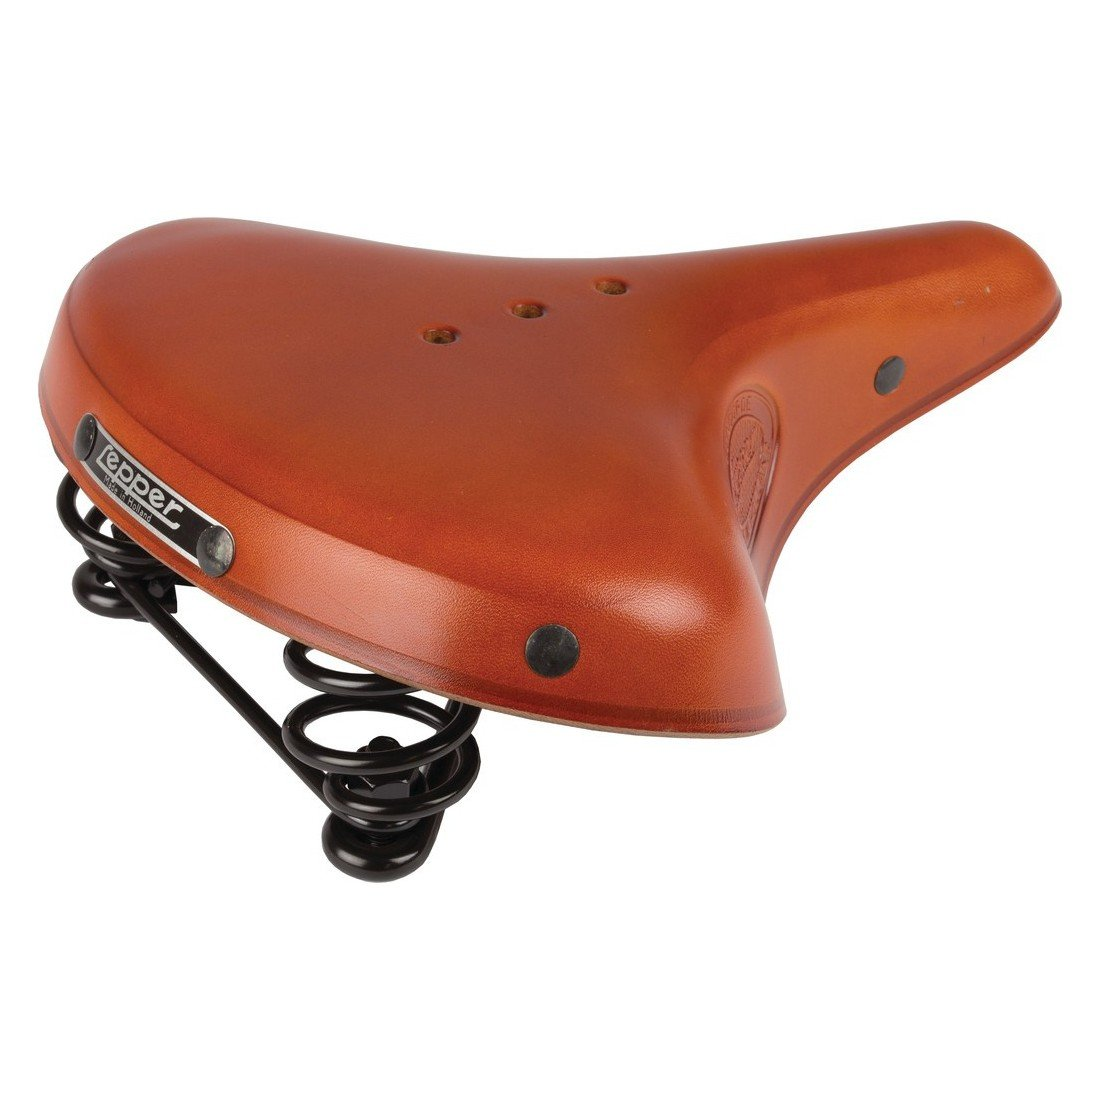 Lepper Primus Herren Fahrrad Sattel Kernleder Fahrradsattel Leder Vintage Retro Gefedert Farbe schwarz